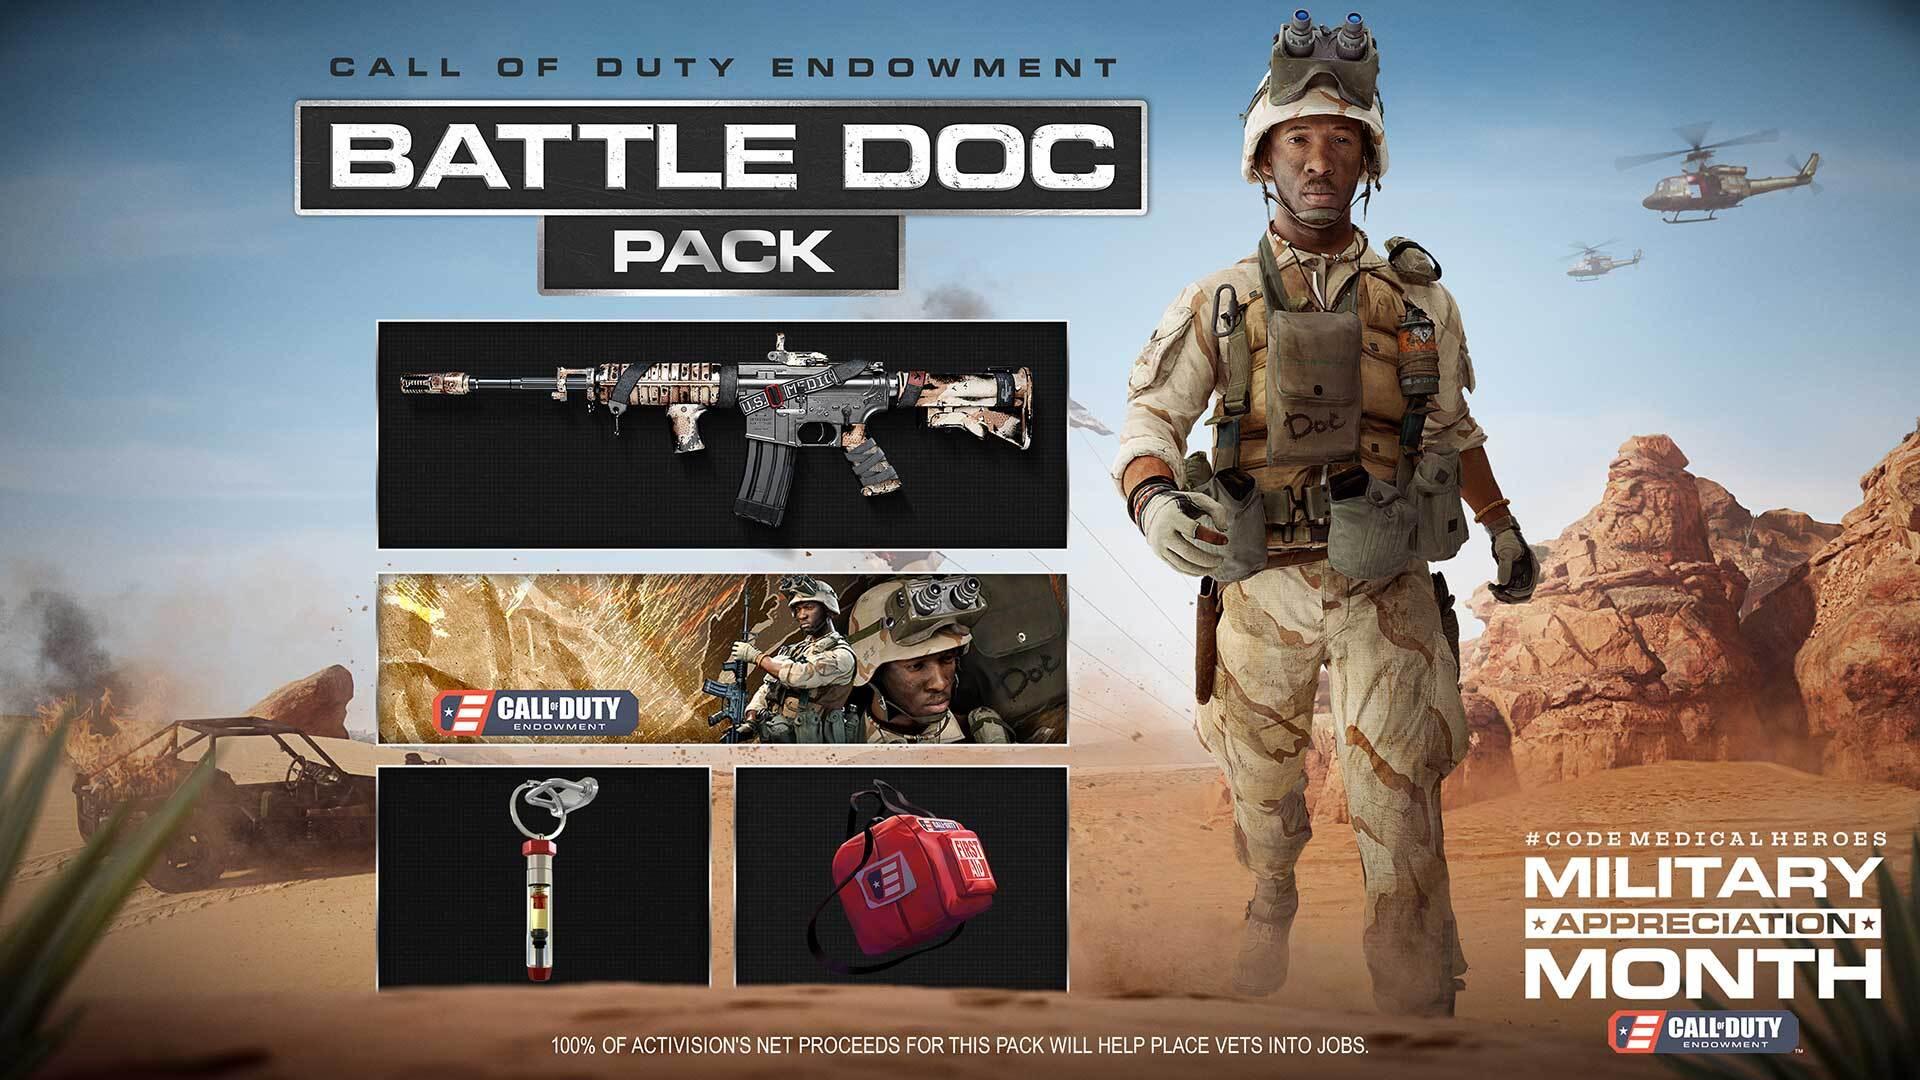 Battle Doc pack